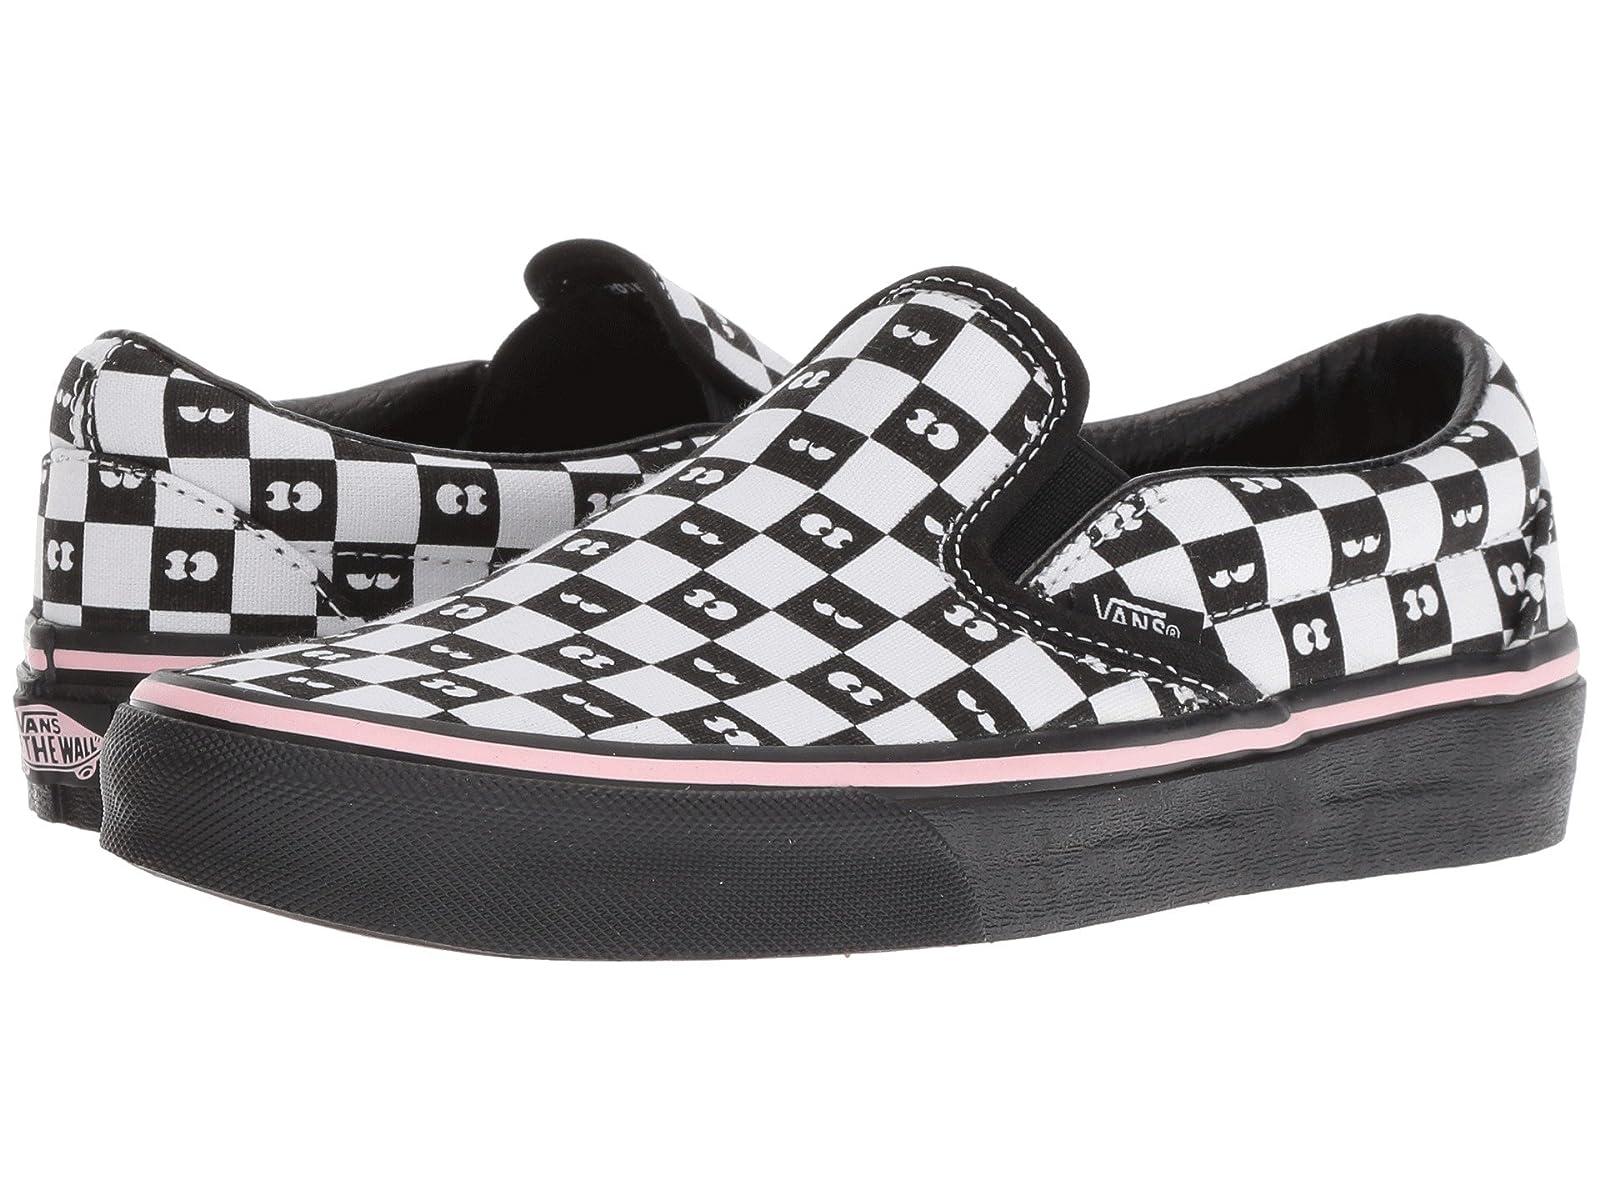 Vans Classic Slip-On X Lazy Oaf CollabAtmospheric grades have affordable shoes